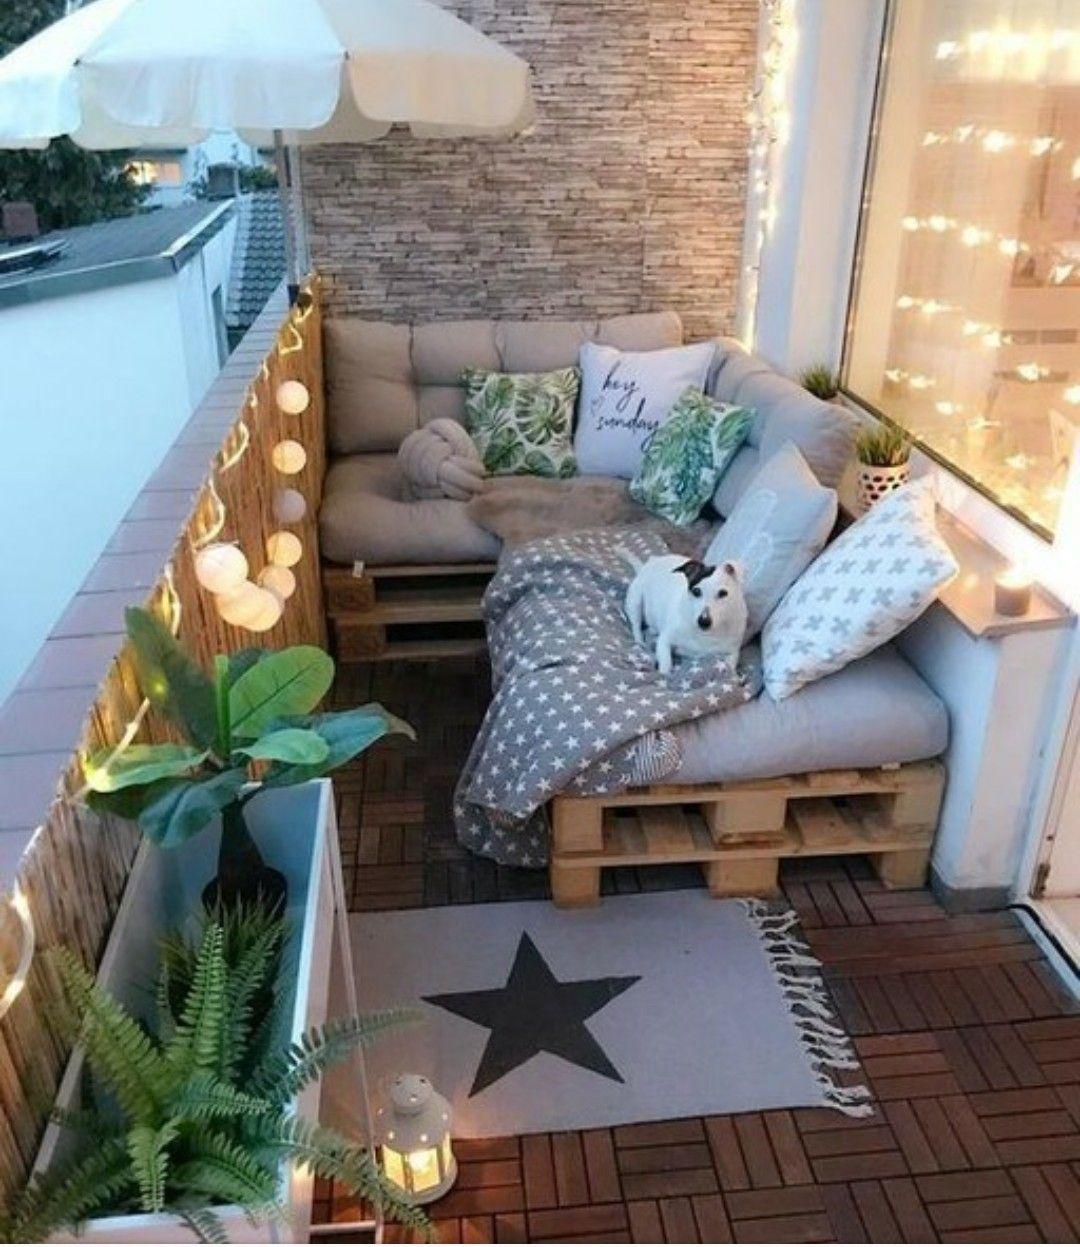 Pin by Linda Grunewald on Design ideas  Small balcony decor